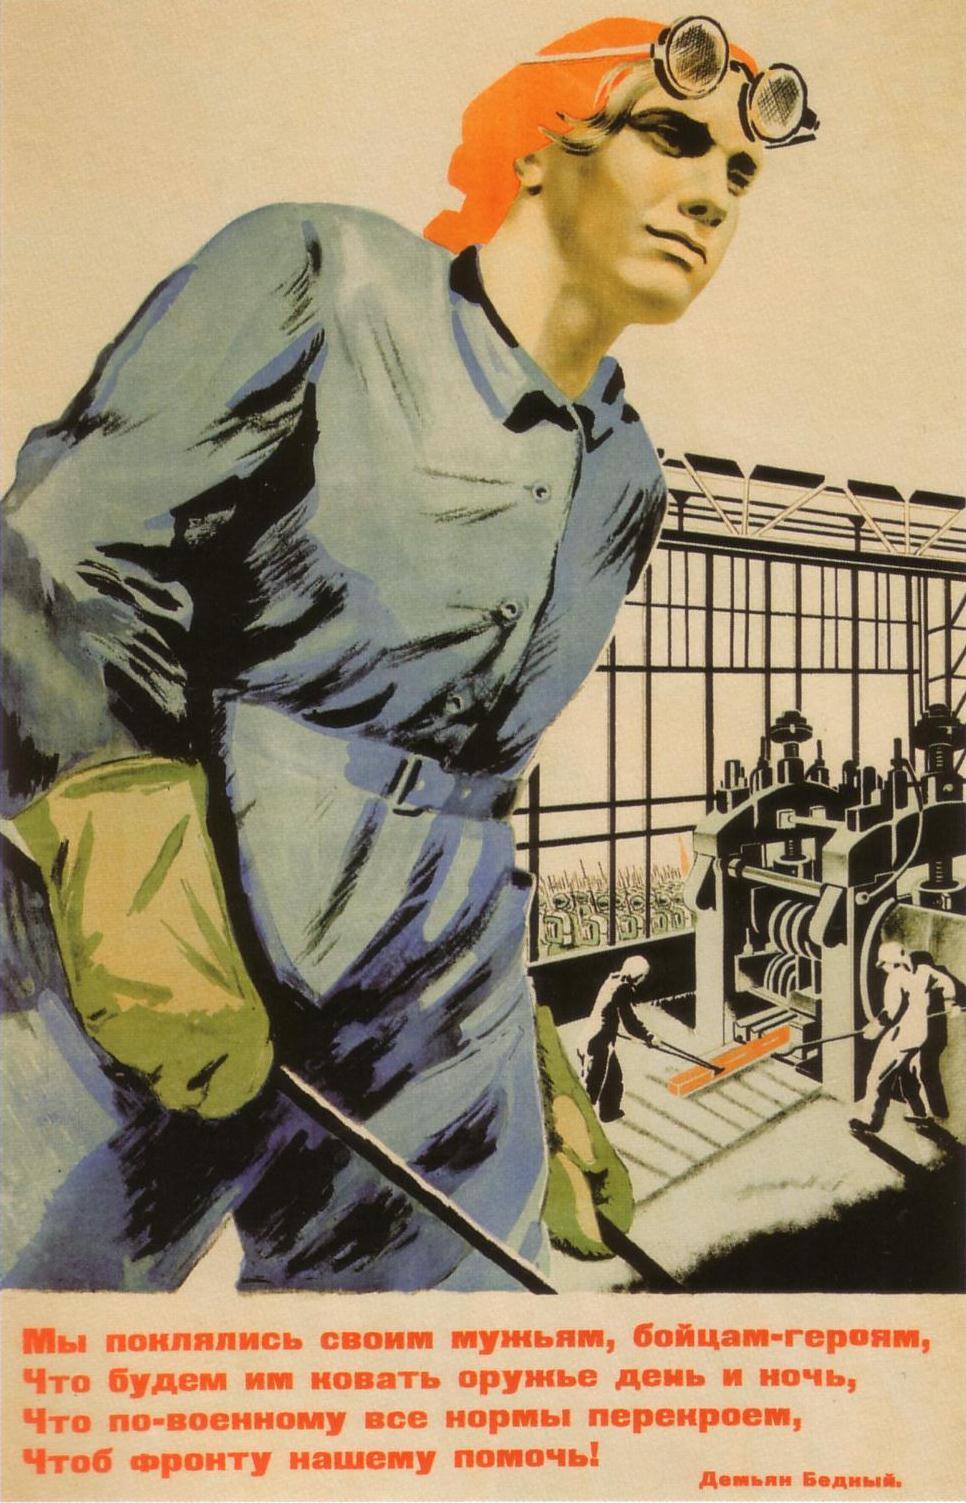 Мы поклялись своим мужьям, бойцам-героям... Автор: М. Бри-Бейн Год: 1941